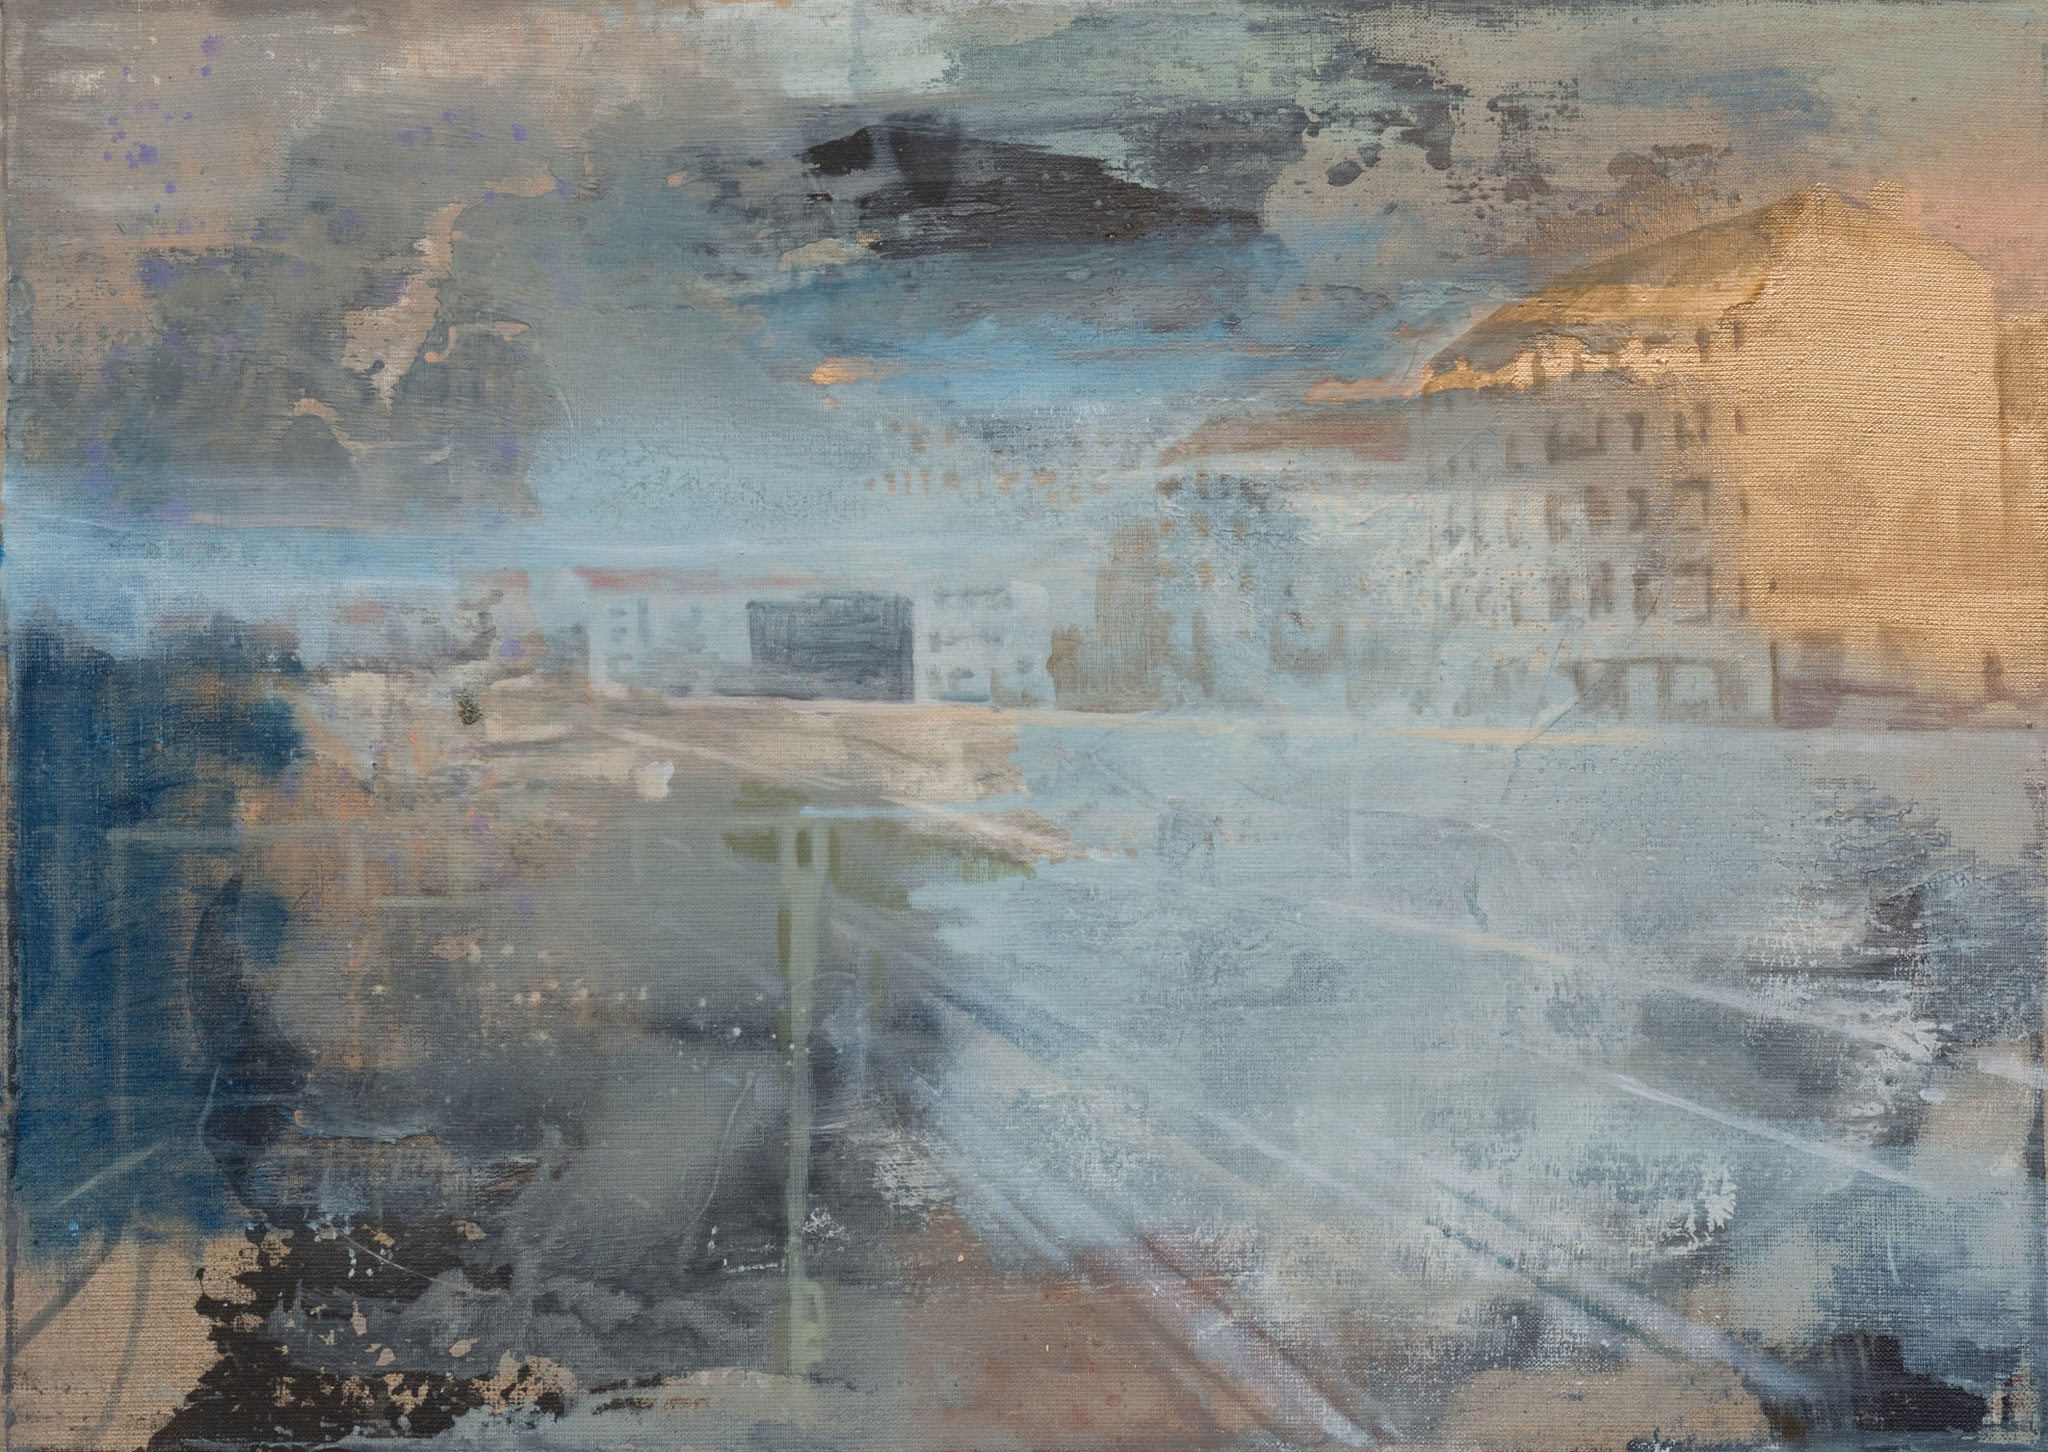 "Frauke Bohge, ""Woher kommst du?"", 2020, Öl auf Leinwand, 50 x 70 cm, VG Bild-Kunst"